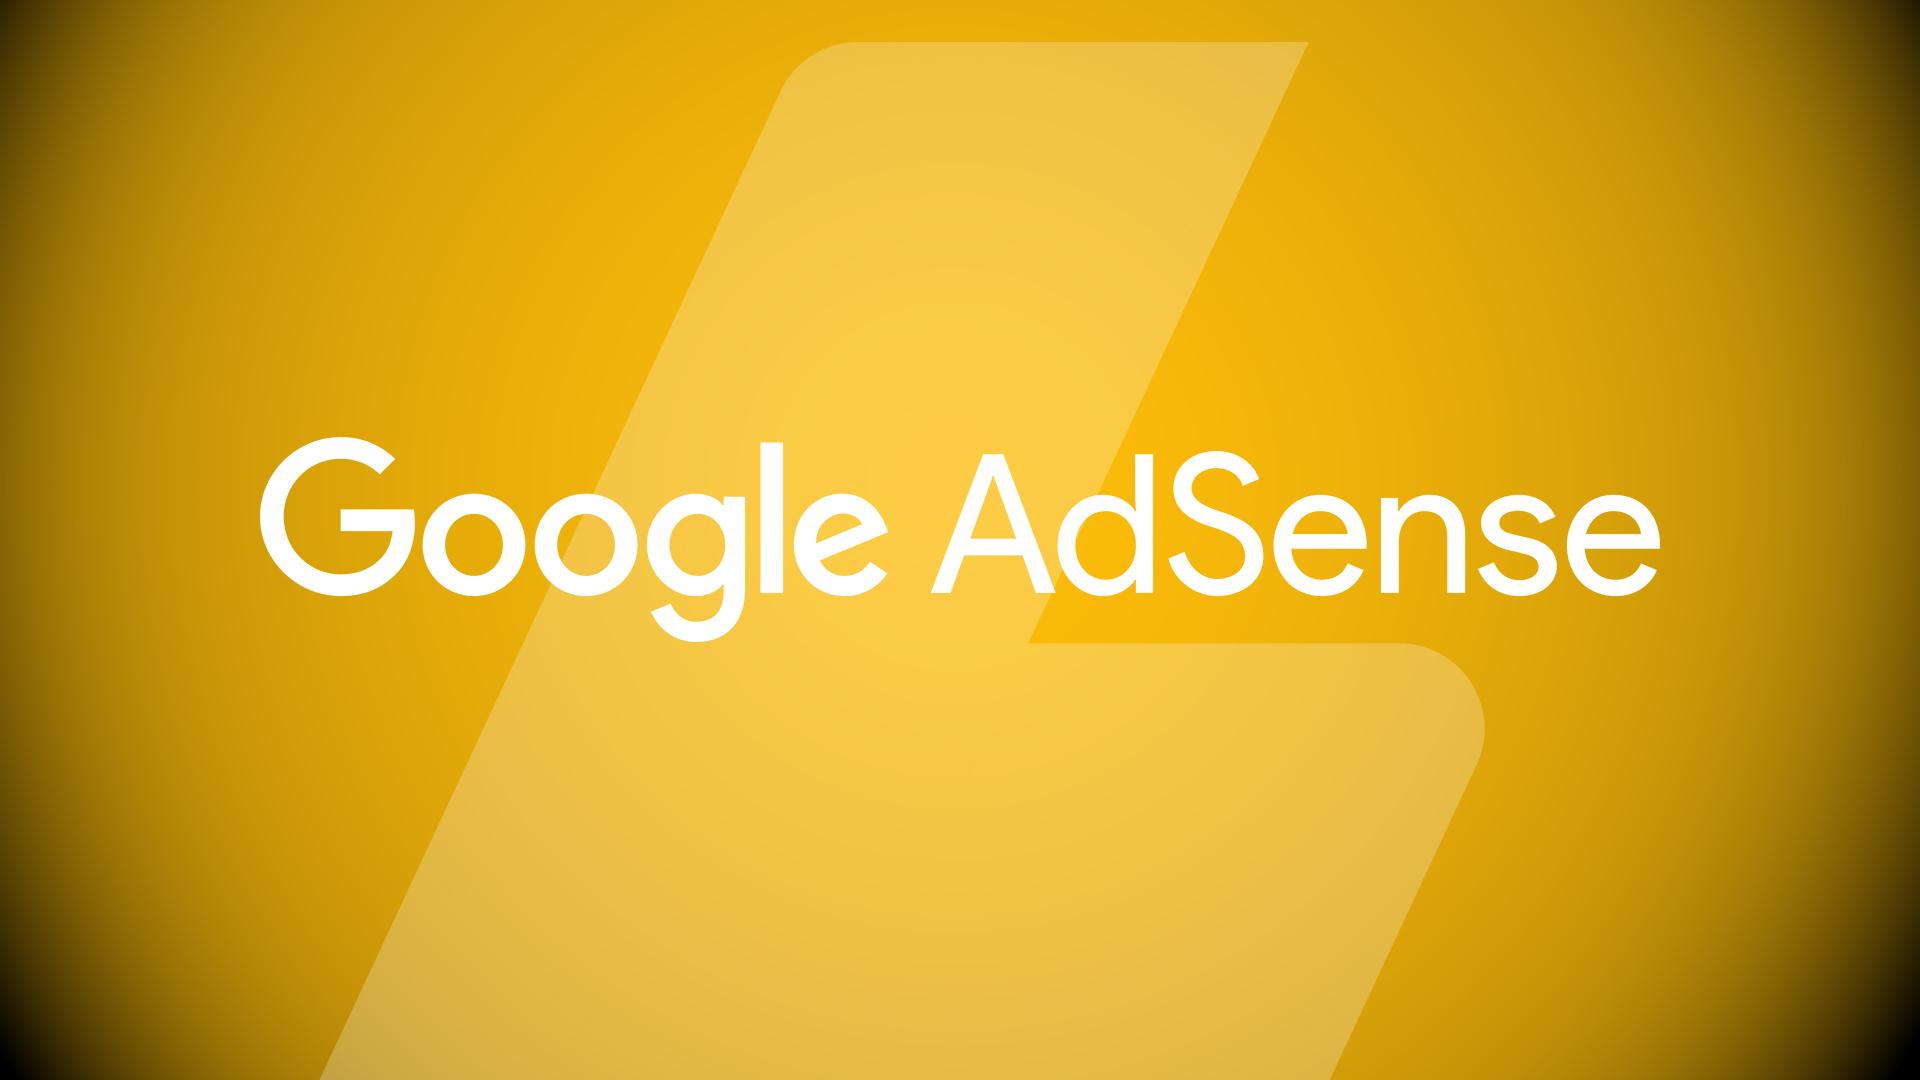 google-adsense-icon7-1920